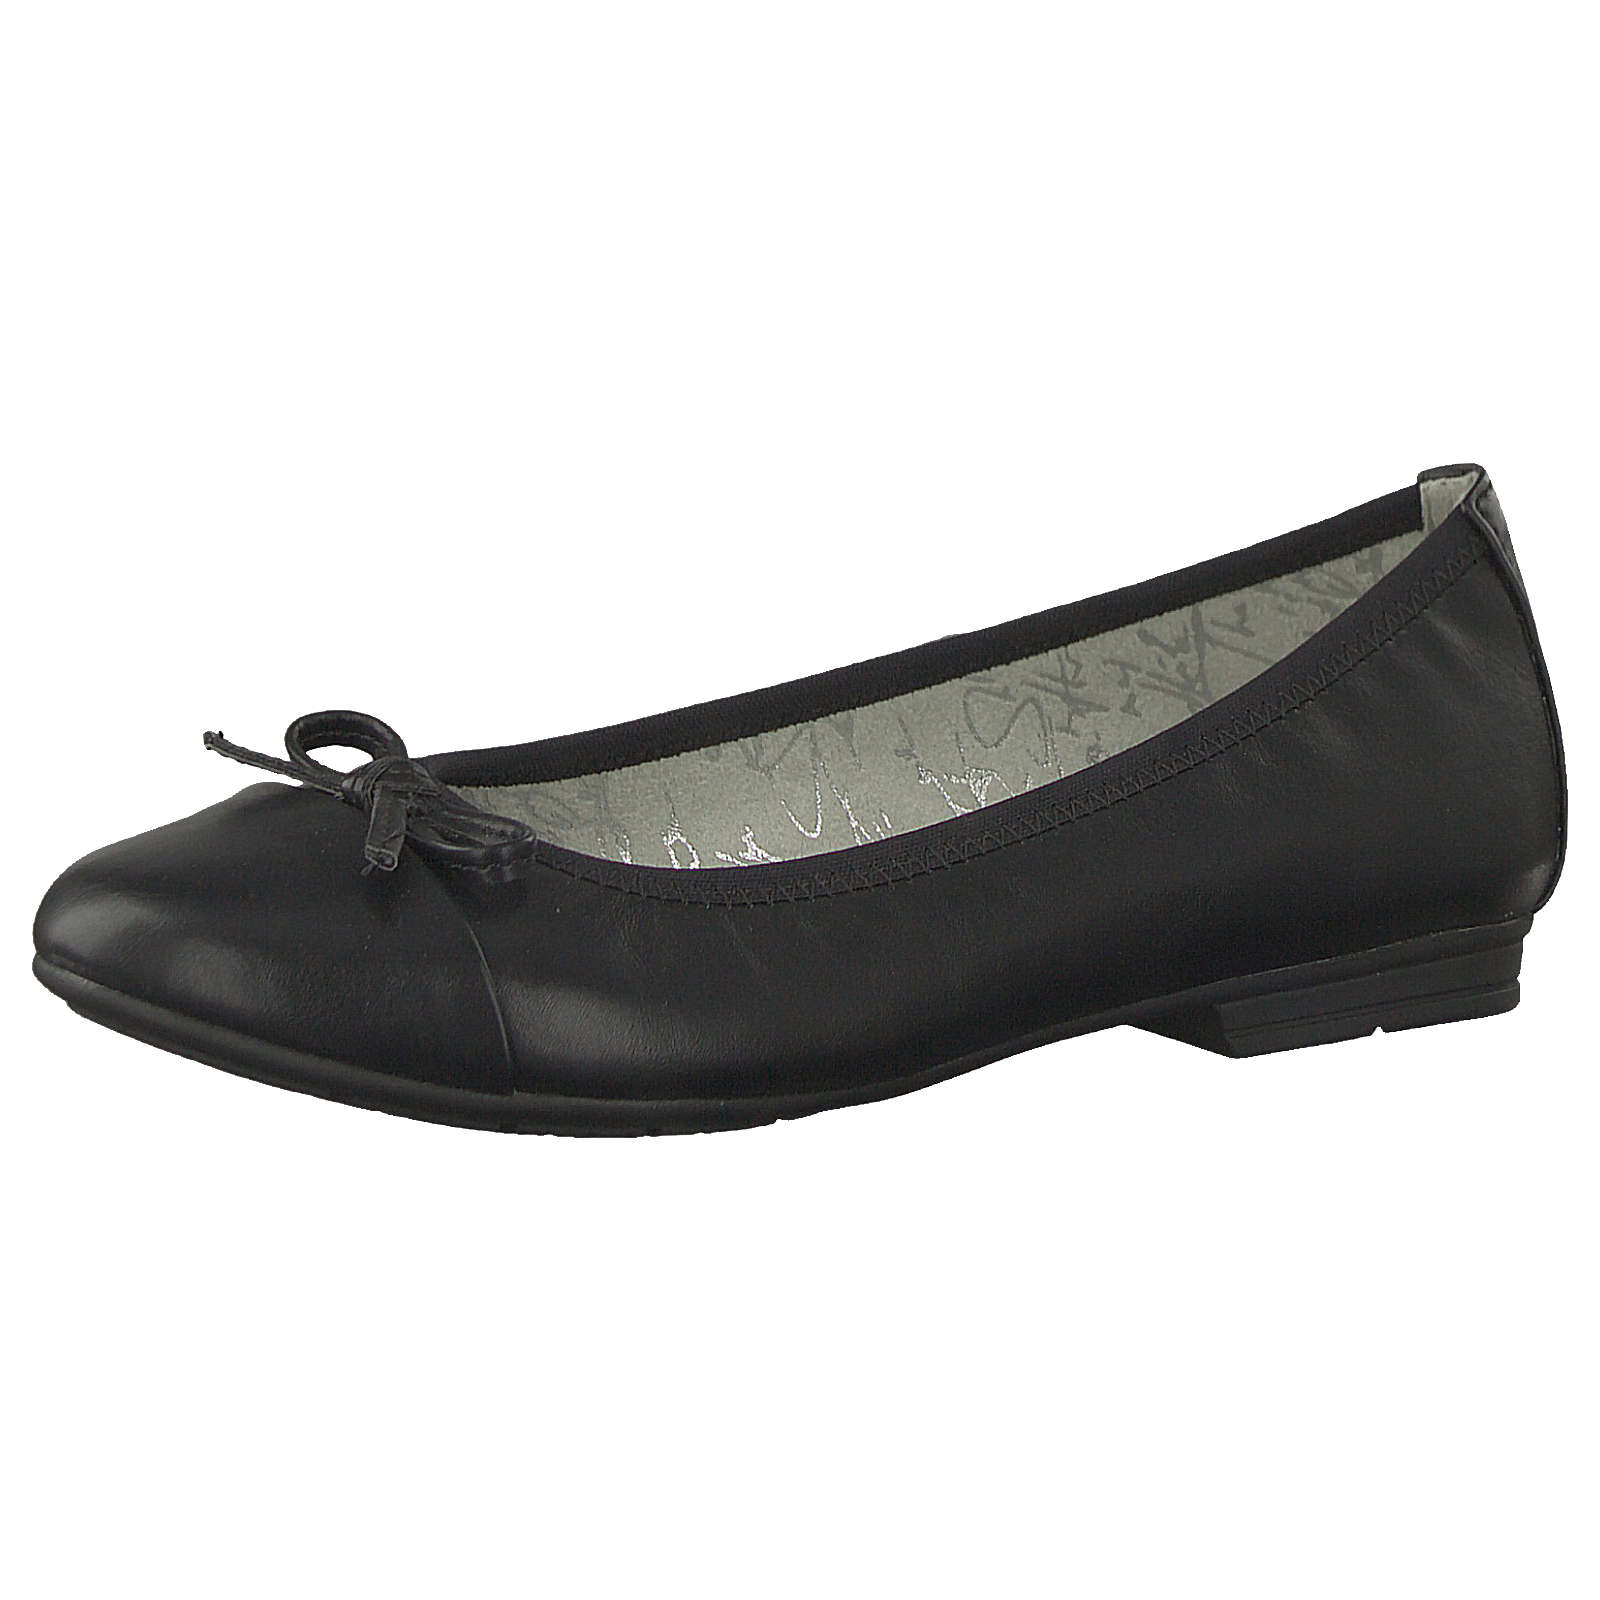 Jana Komfort-Ballerinas schwarz Damen Gr. 36